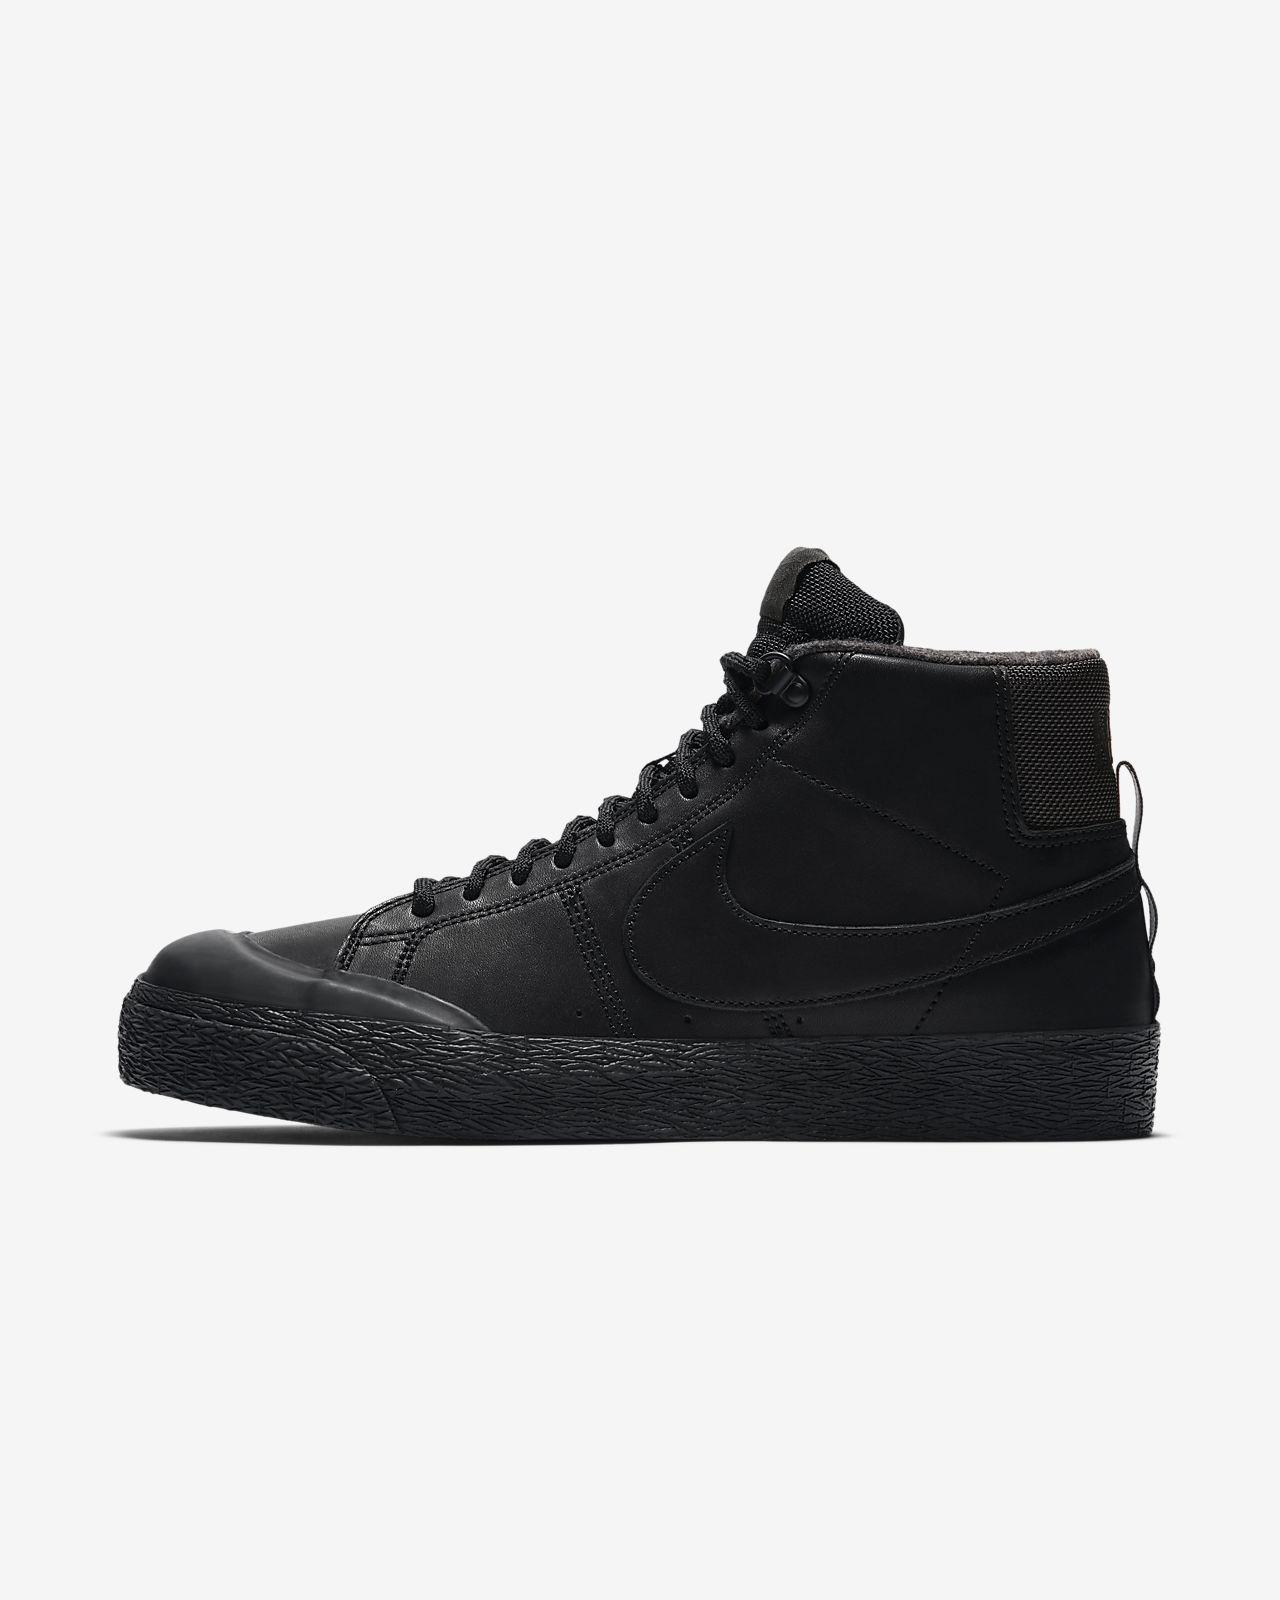 Nike SB Blazer Zoom Mid XT Bota / -Anthracite ZA1zZA